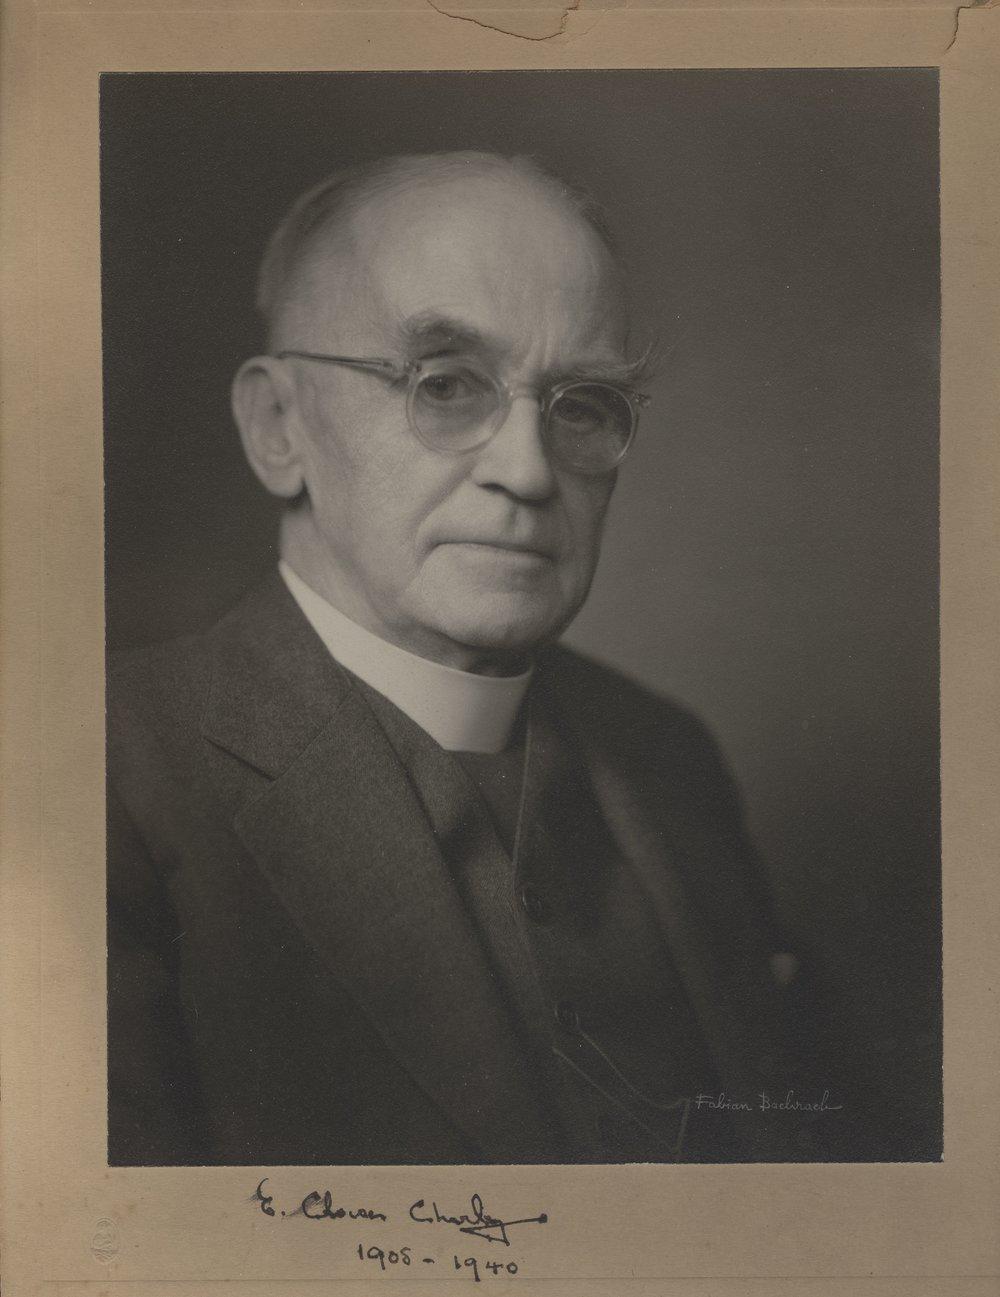 St. Philip's | 1900s - 1950s